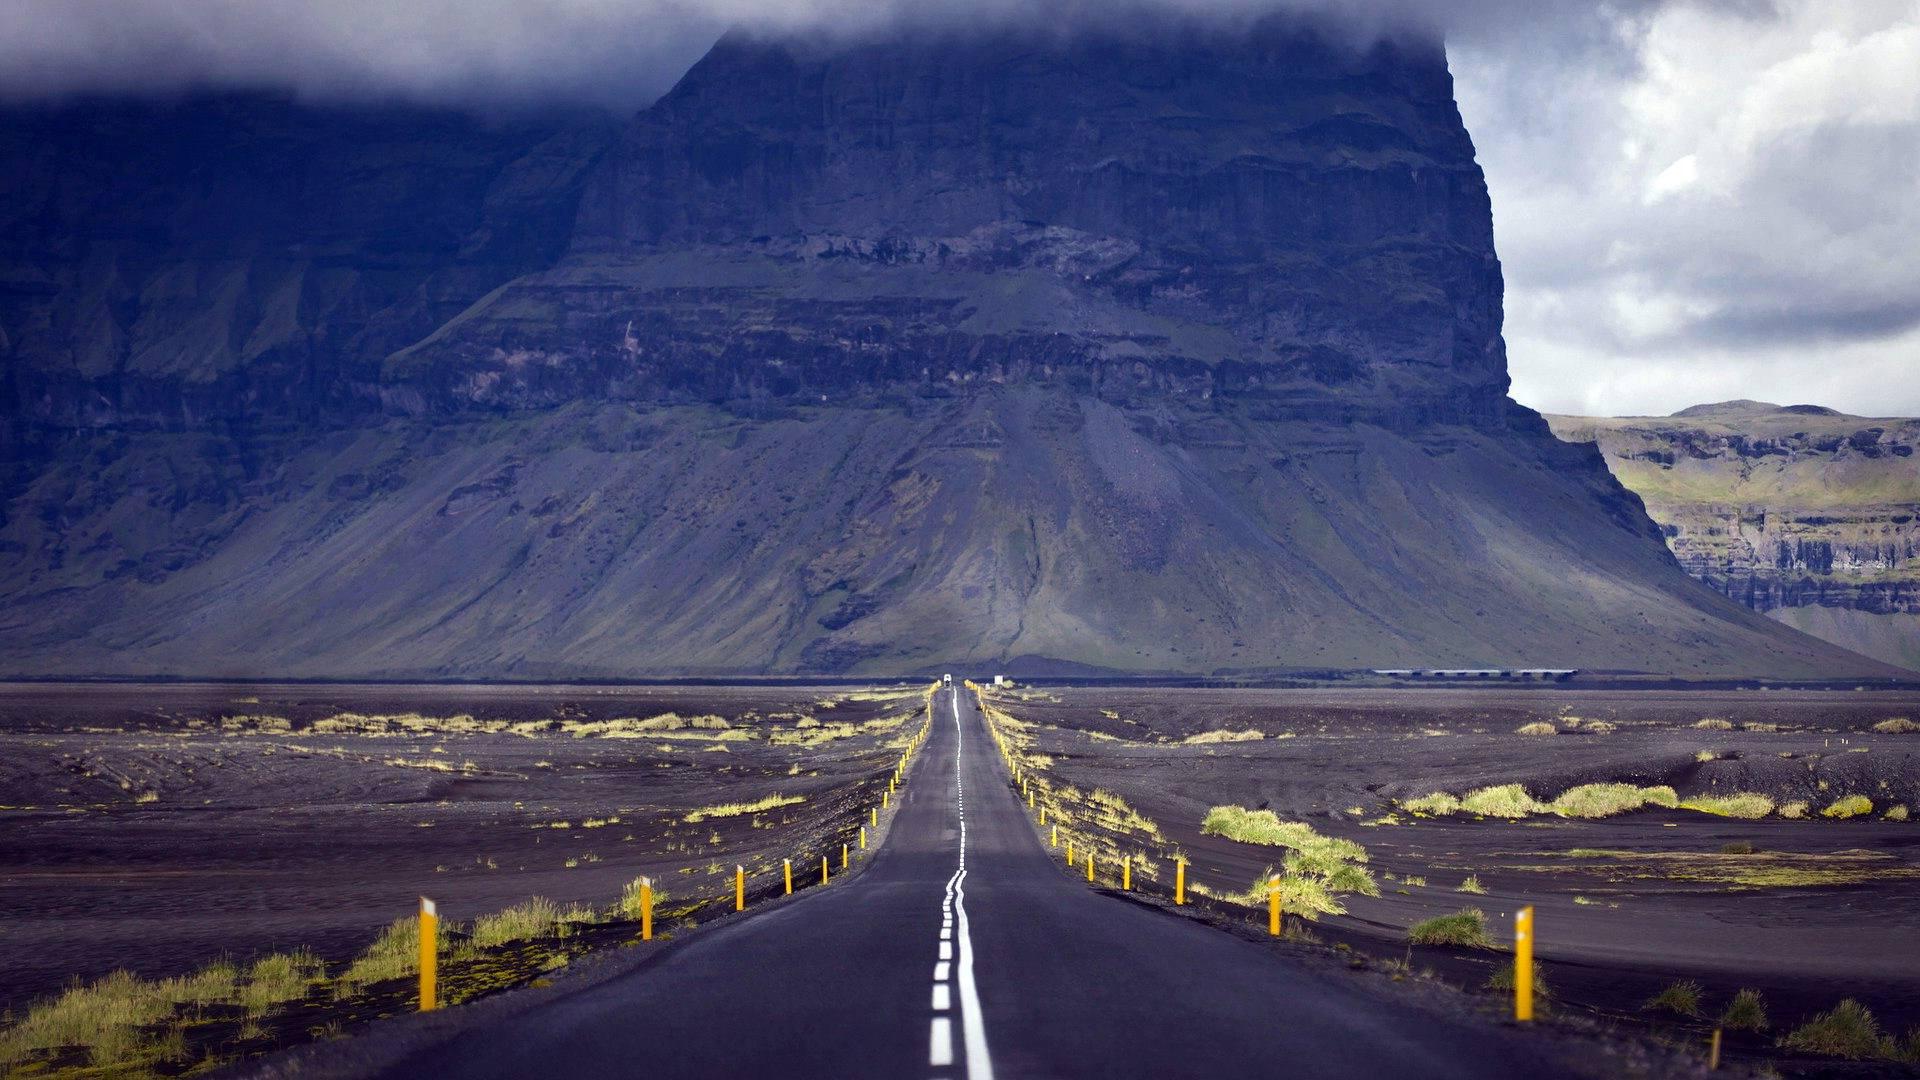 Дорога, пейзаж, природа, гора, обои hd